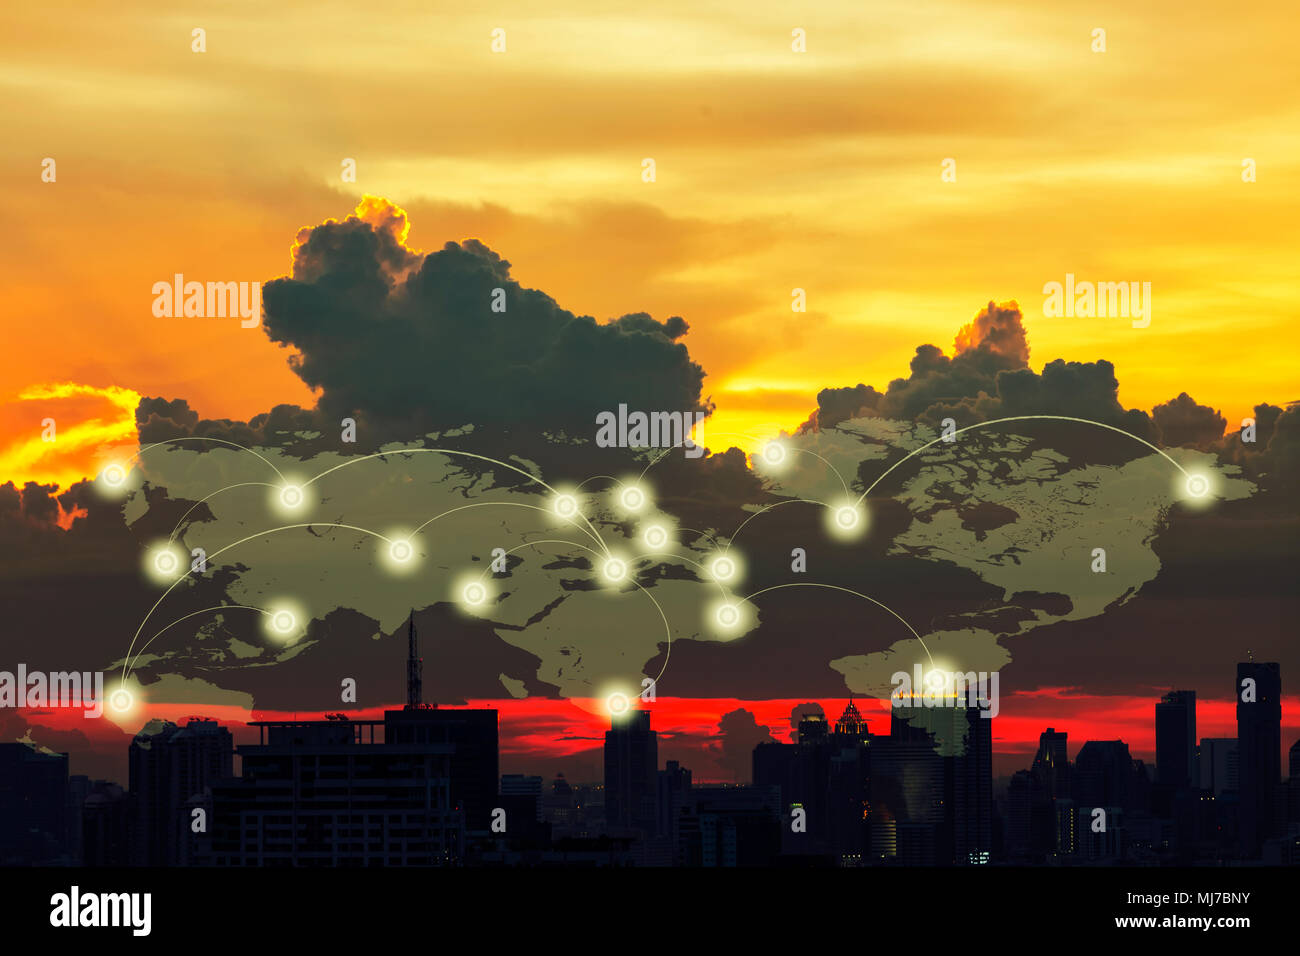 Internet map globe world lines imgenes de stock internet map comunicacin de conexin digital global el concepto de red social conexin de lneas y puntos gumiabroncs Choice Image